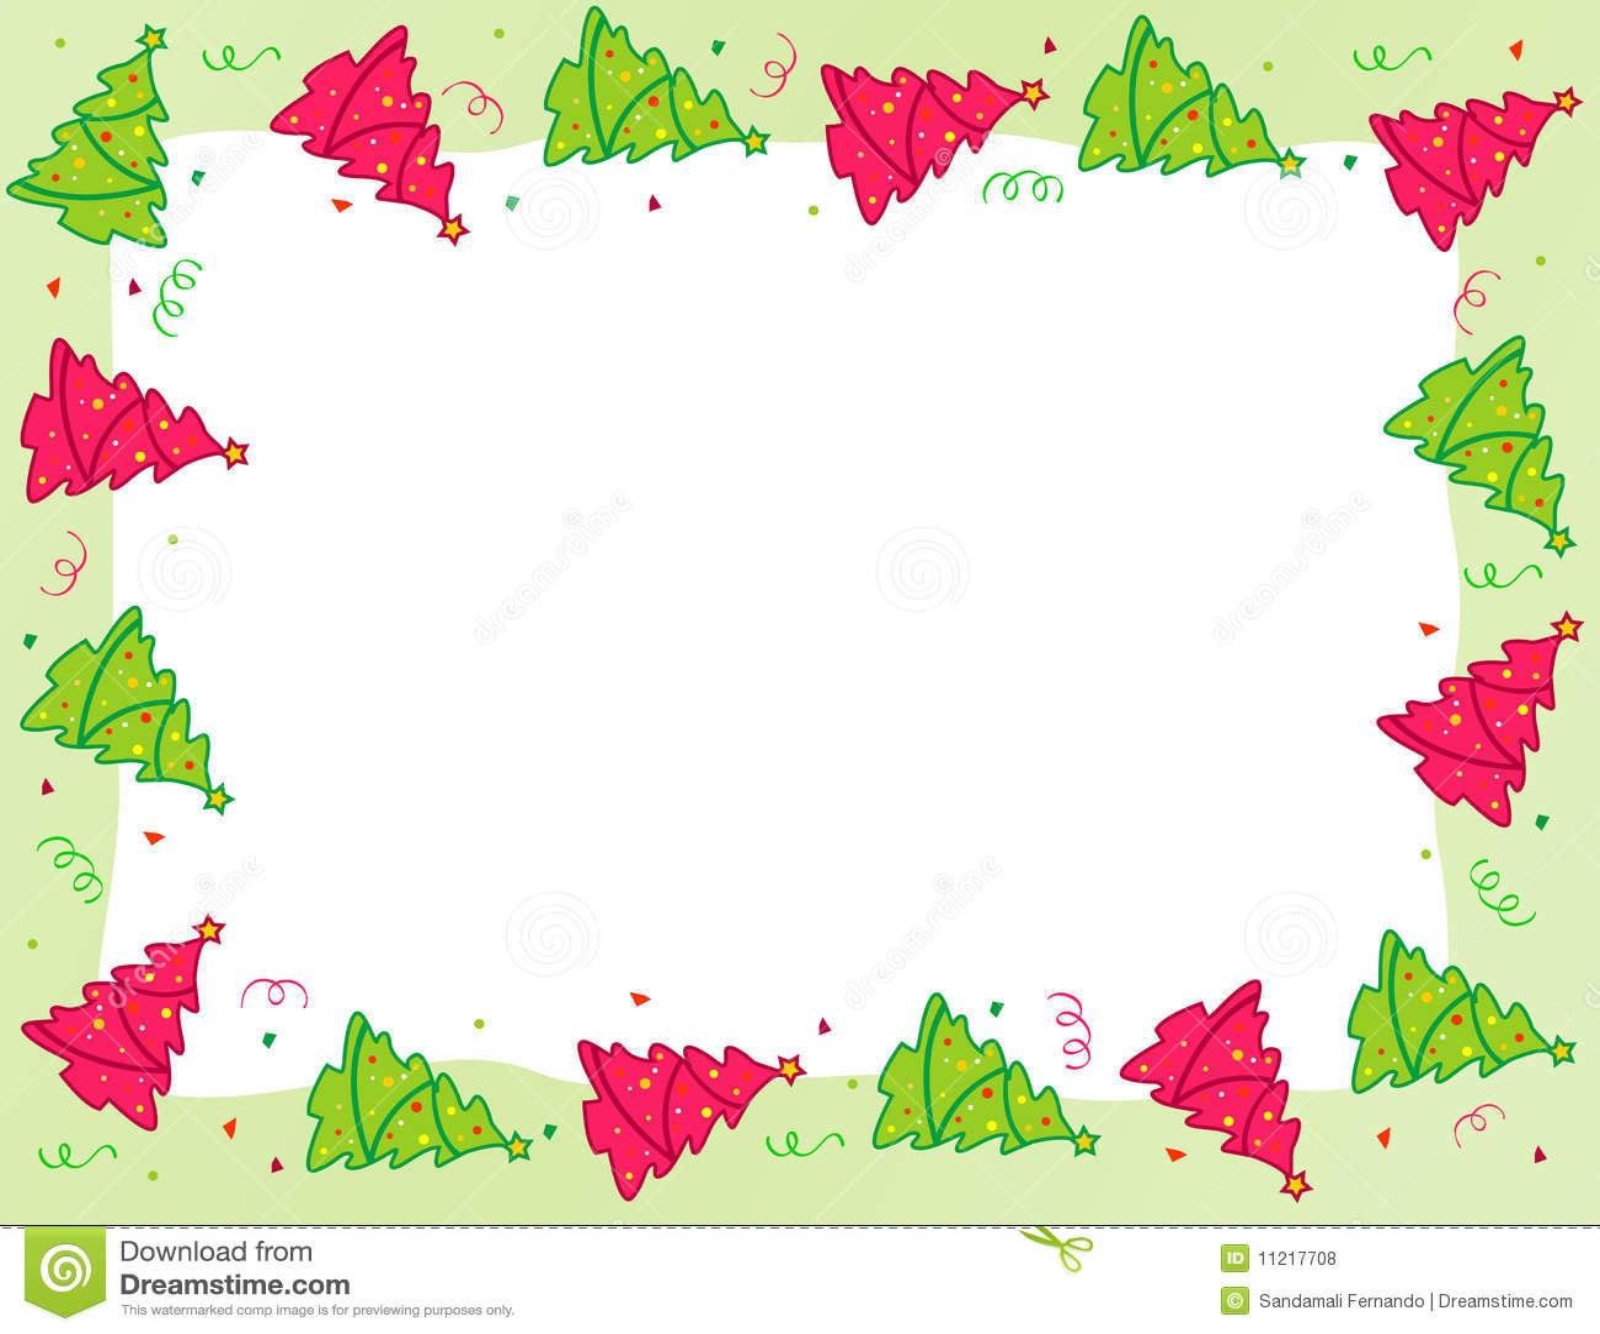 Royalty Free Stock Photos  Christmas Tree borderChristmas Tree Border